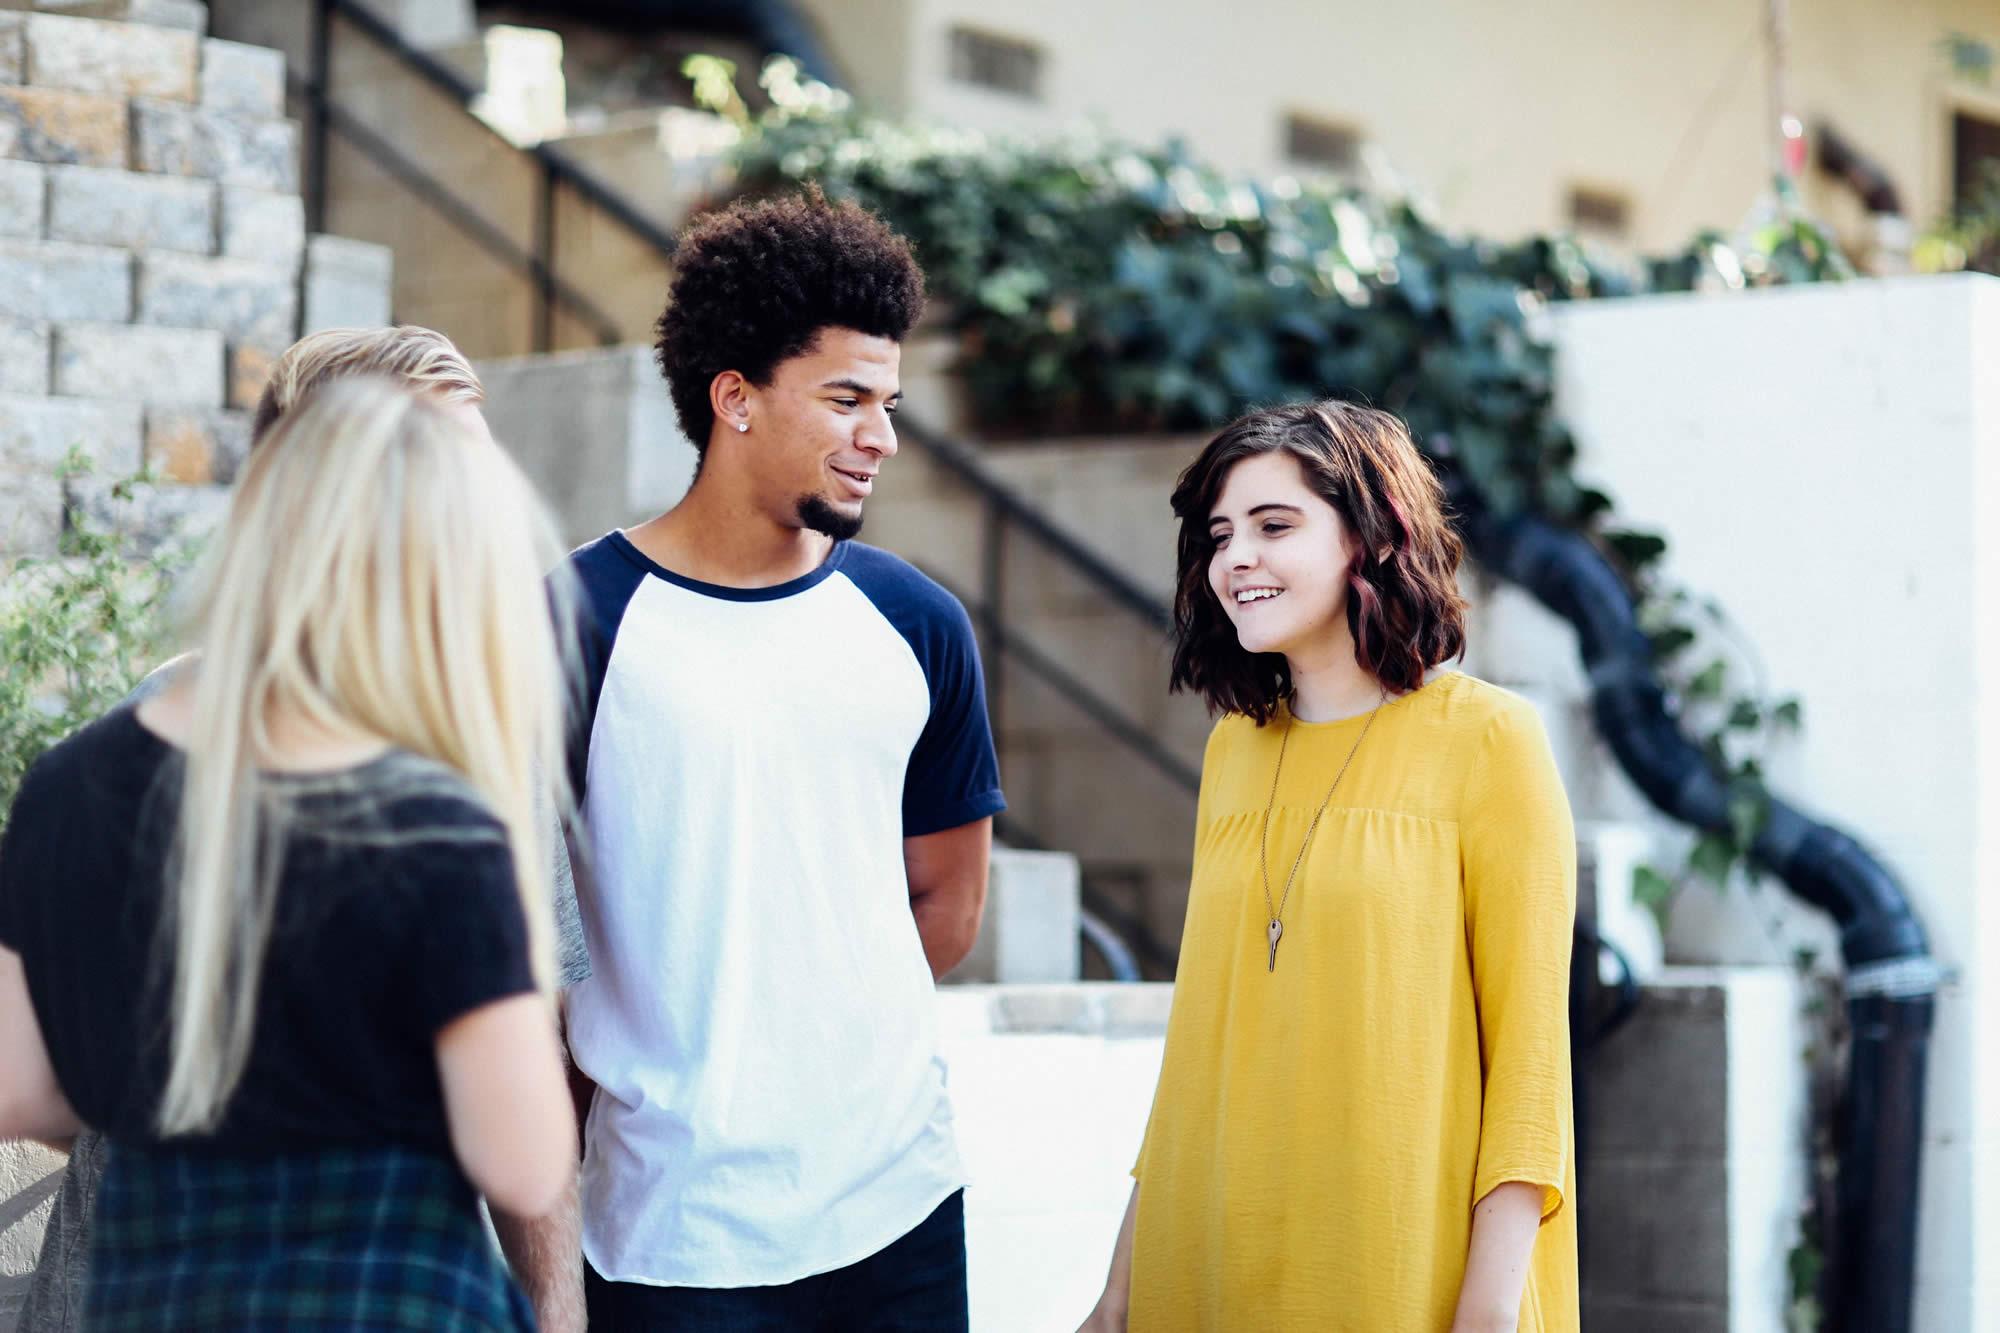 eu students chatting in uk university